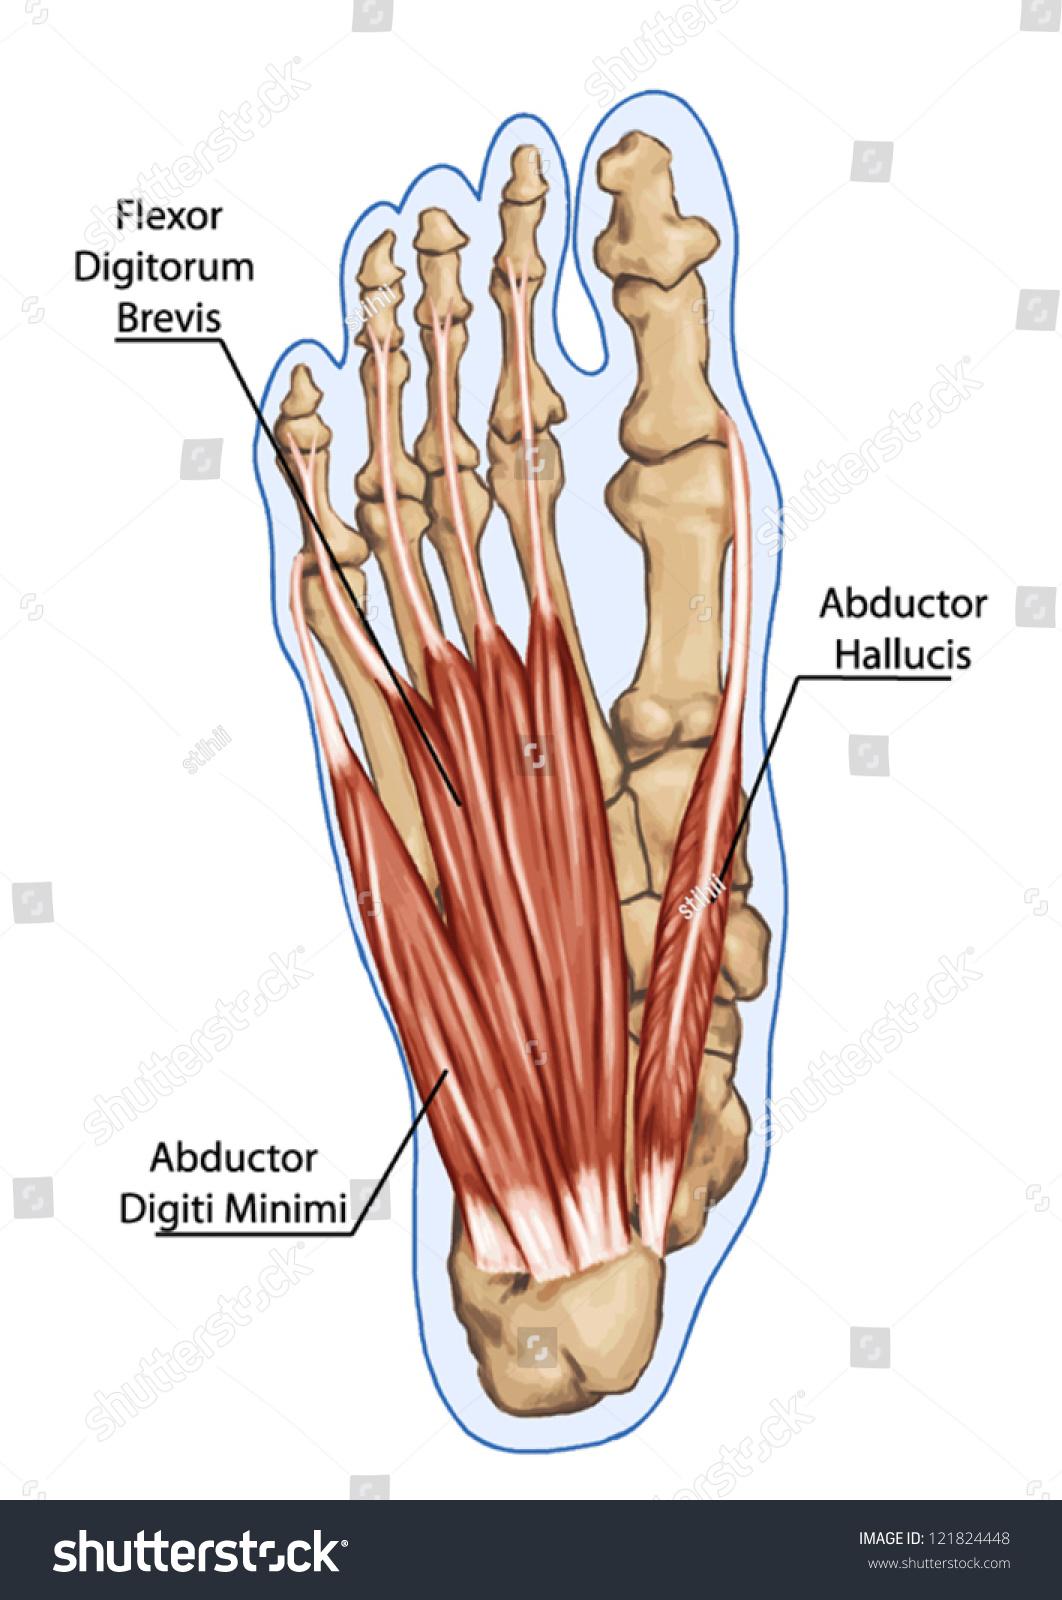 Flexor Digitorum Brevis Anatomy Leg Foot Stock Vector